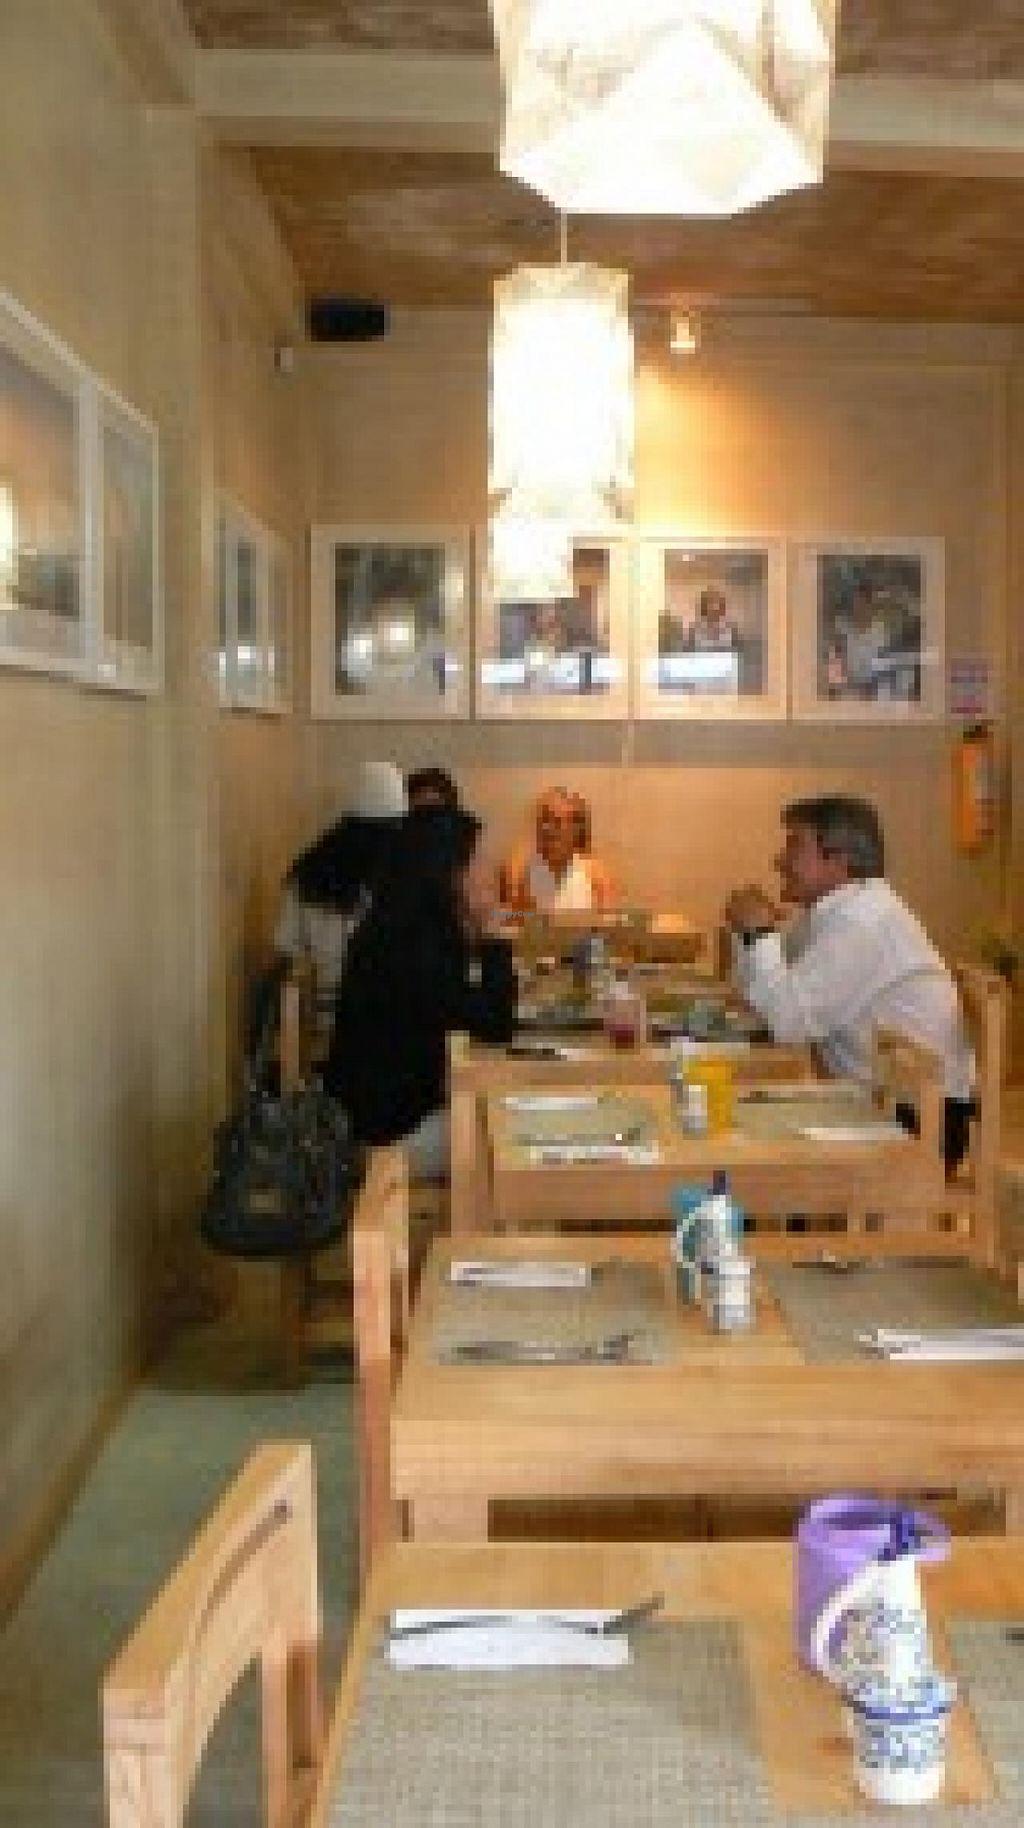 "Photo of Vivir Bonito Restaurante & Mercado  by <a href=""/members/profile/community"">community</a> <br/>Vivir Bonito - Restaurante <br/> December 29, 2014  - <a href='/contact/abuse/image/54164/88915'>Report</a>"